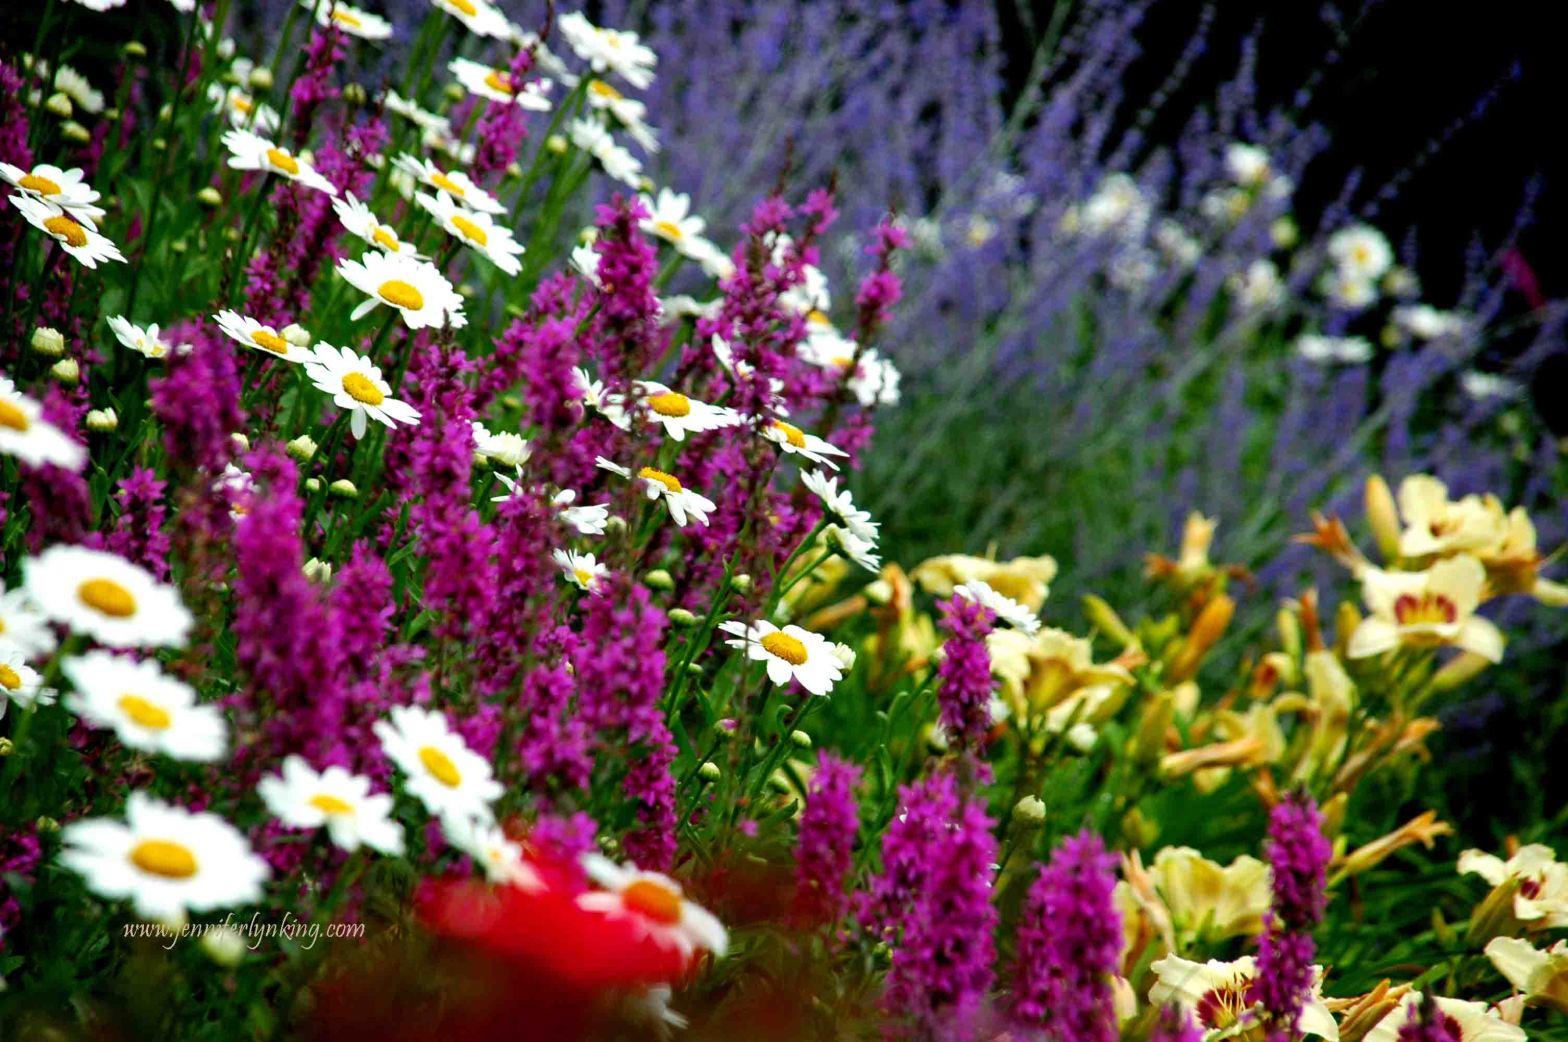 my former USA backyard gardens, colorful bliss